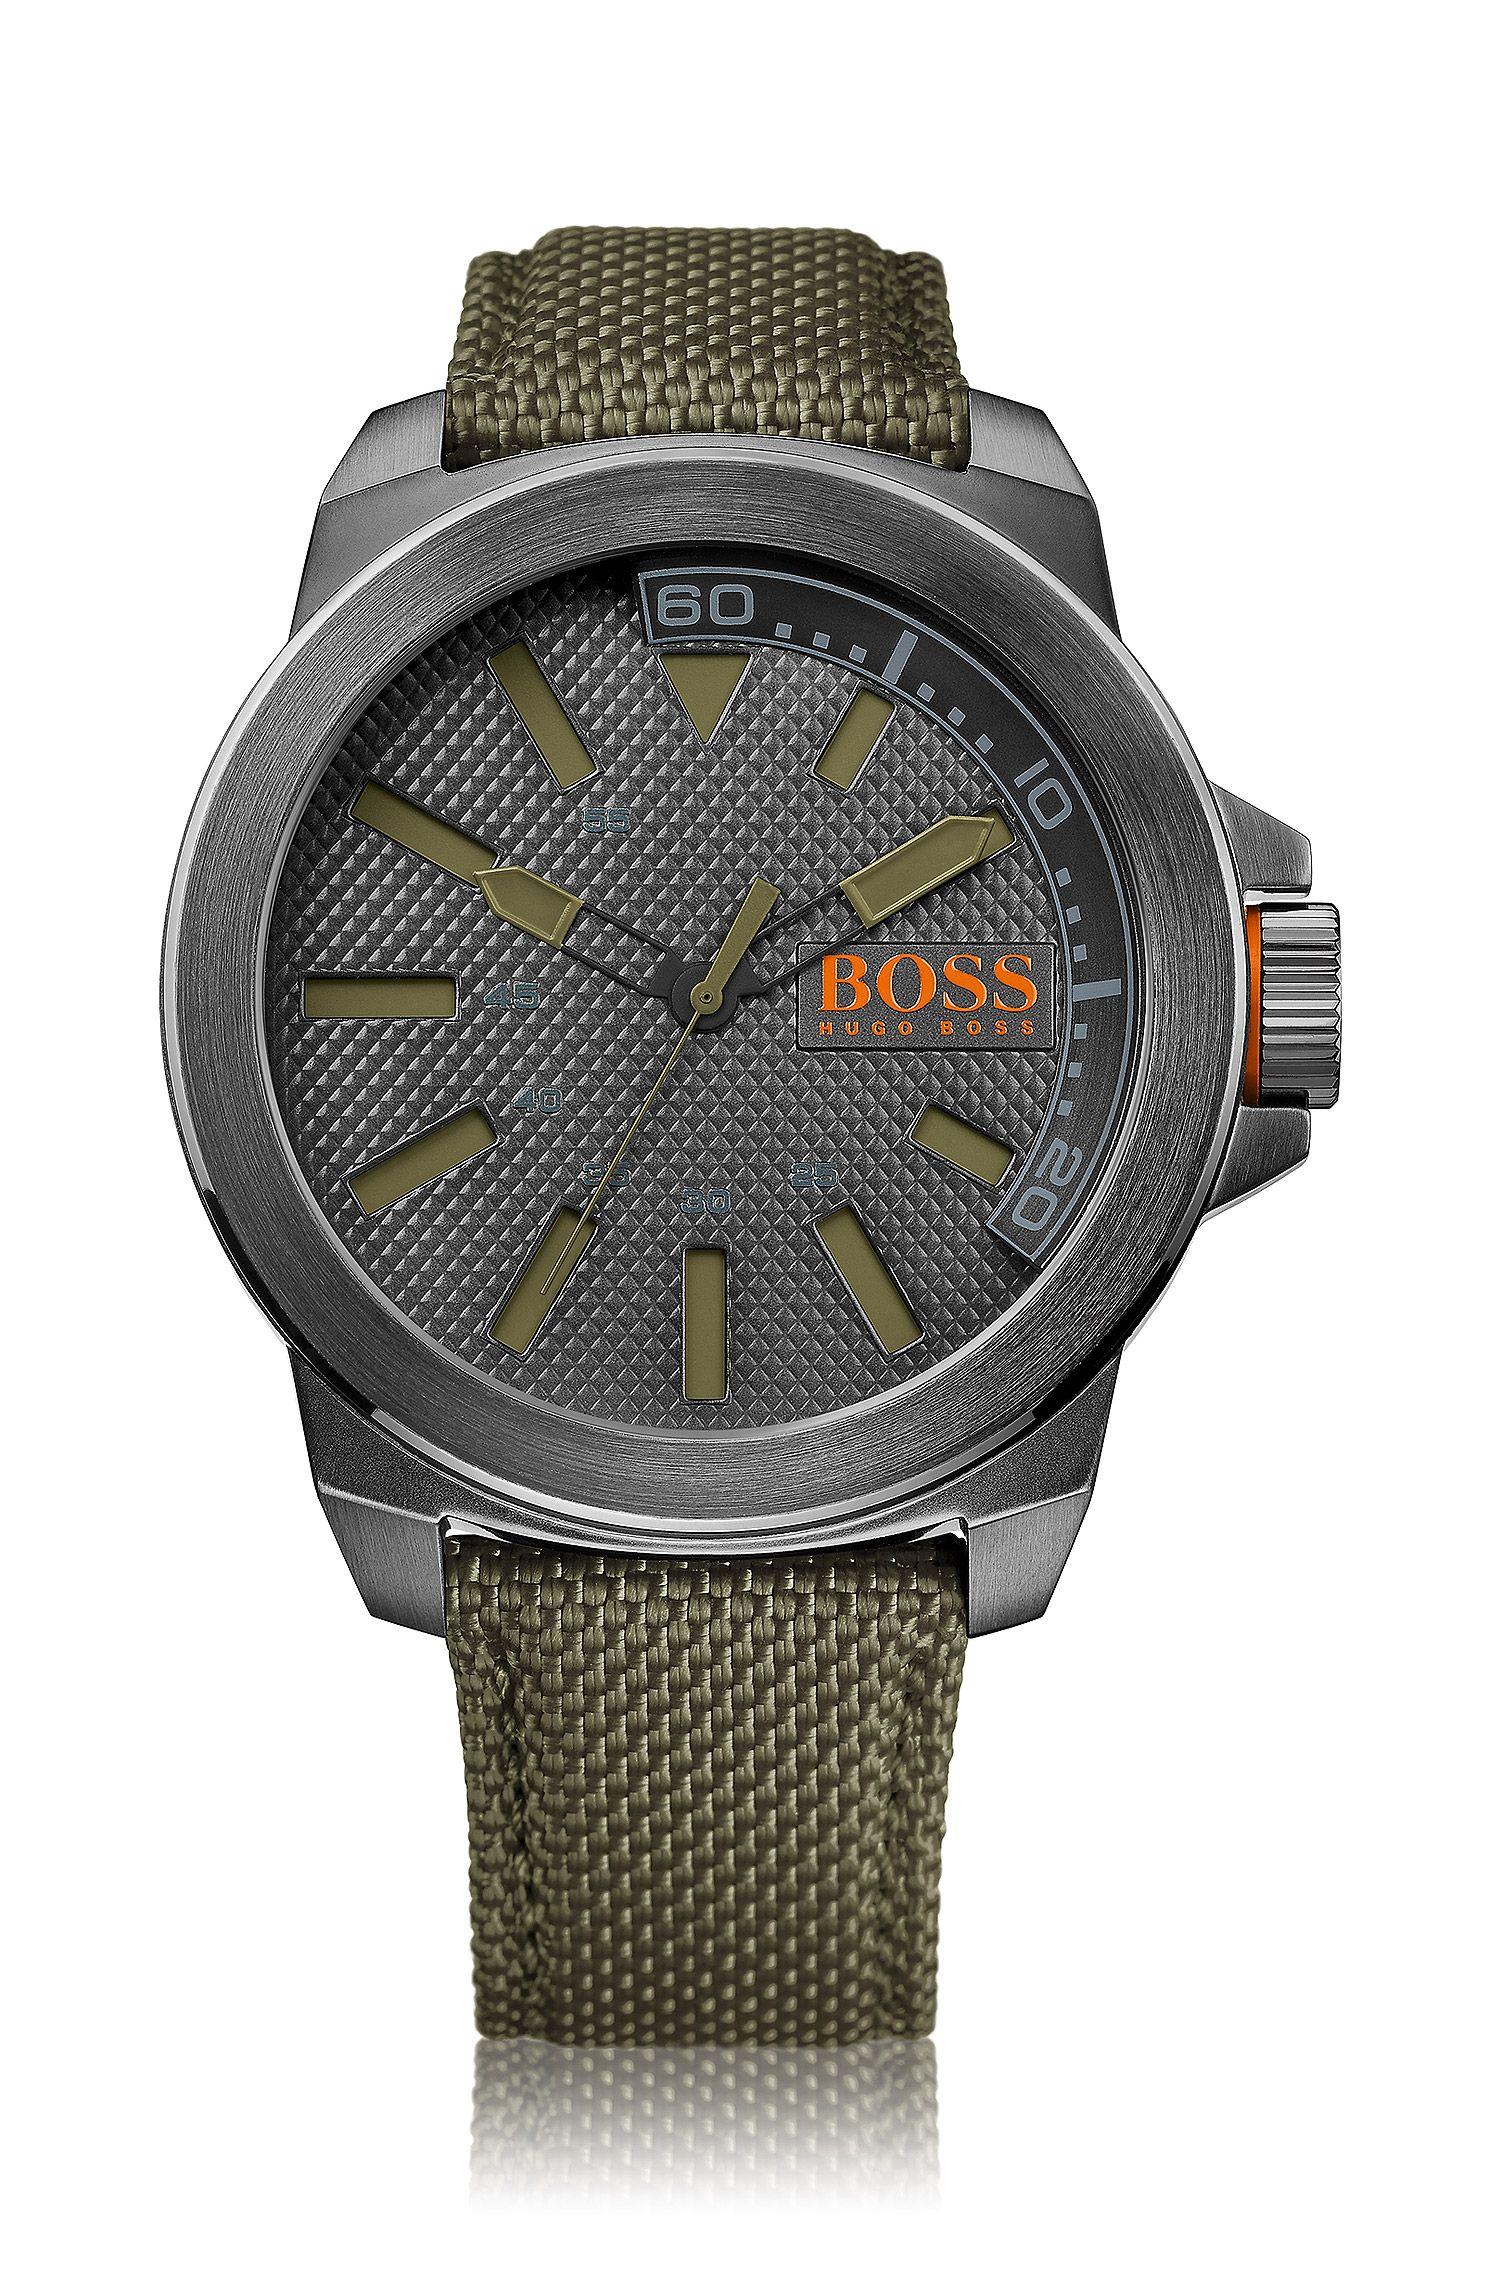 Montre-bracelet «HO7009» avec boîtier en acier inoxydable